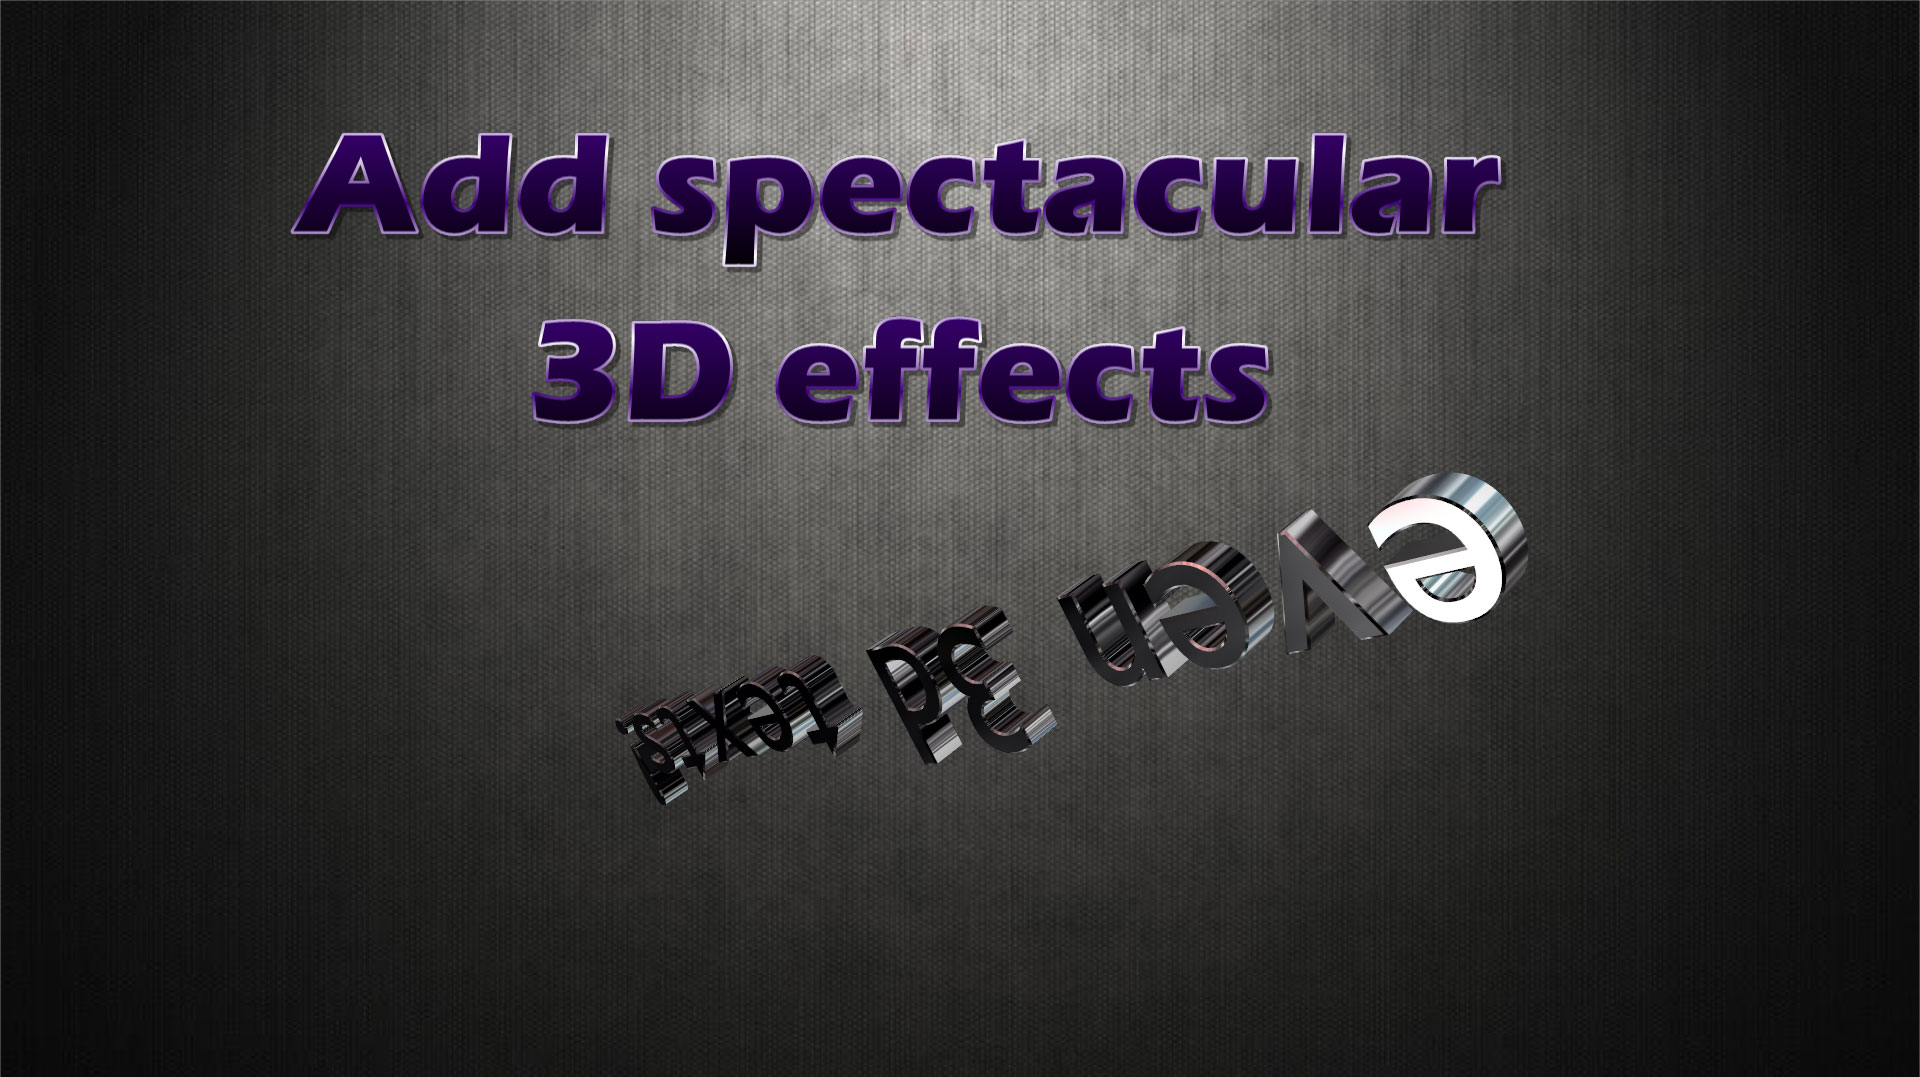 Slide Effect Professional, Design, Photo & Graphics Software Screenshot